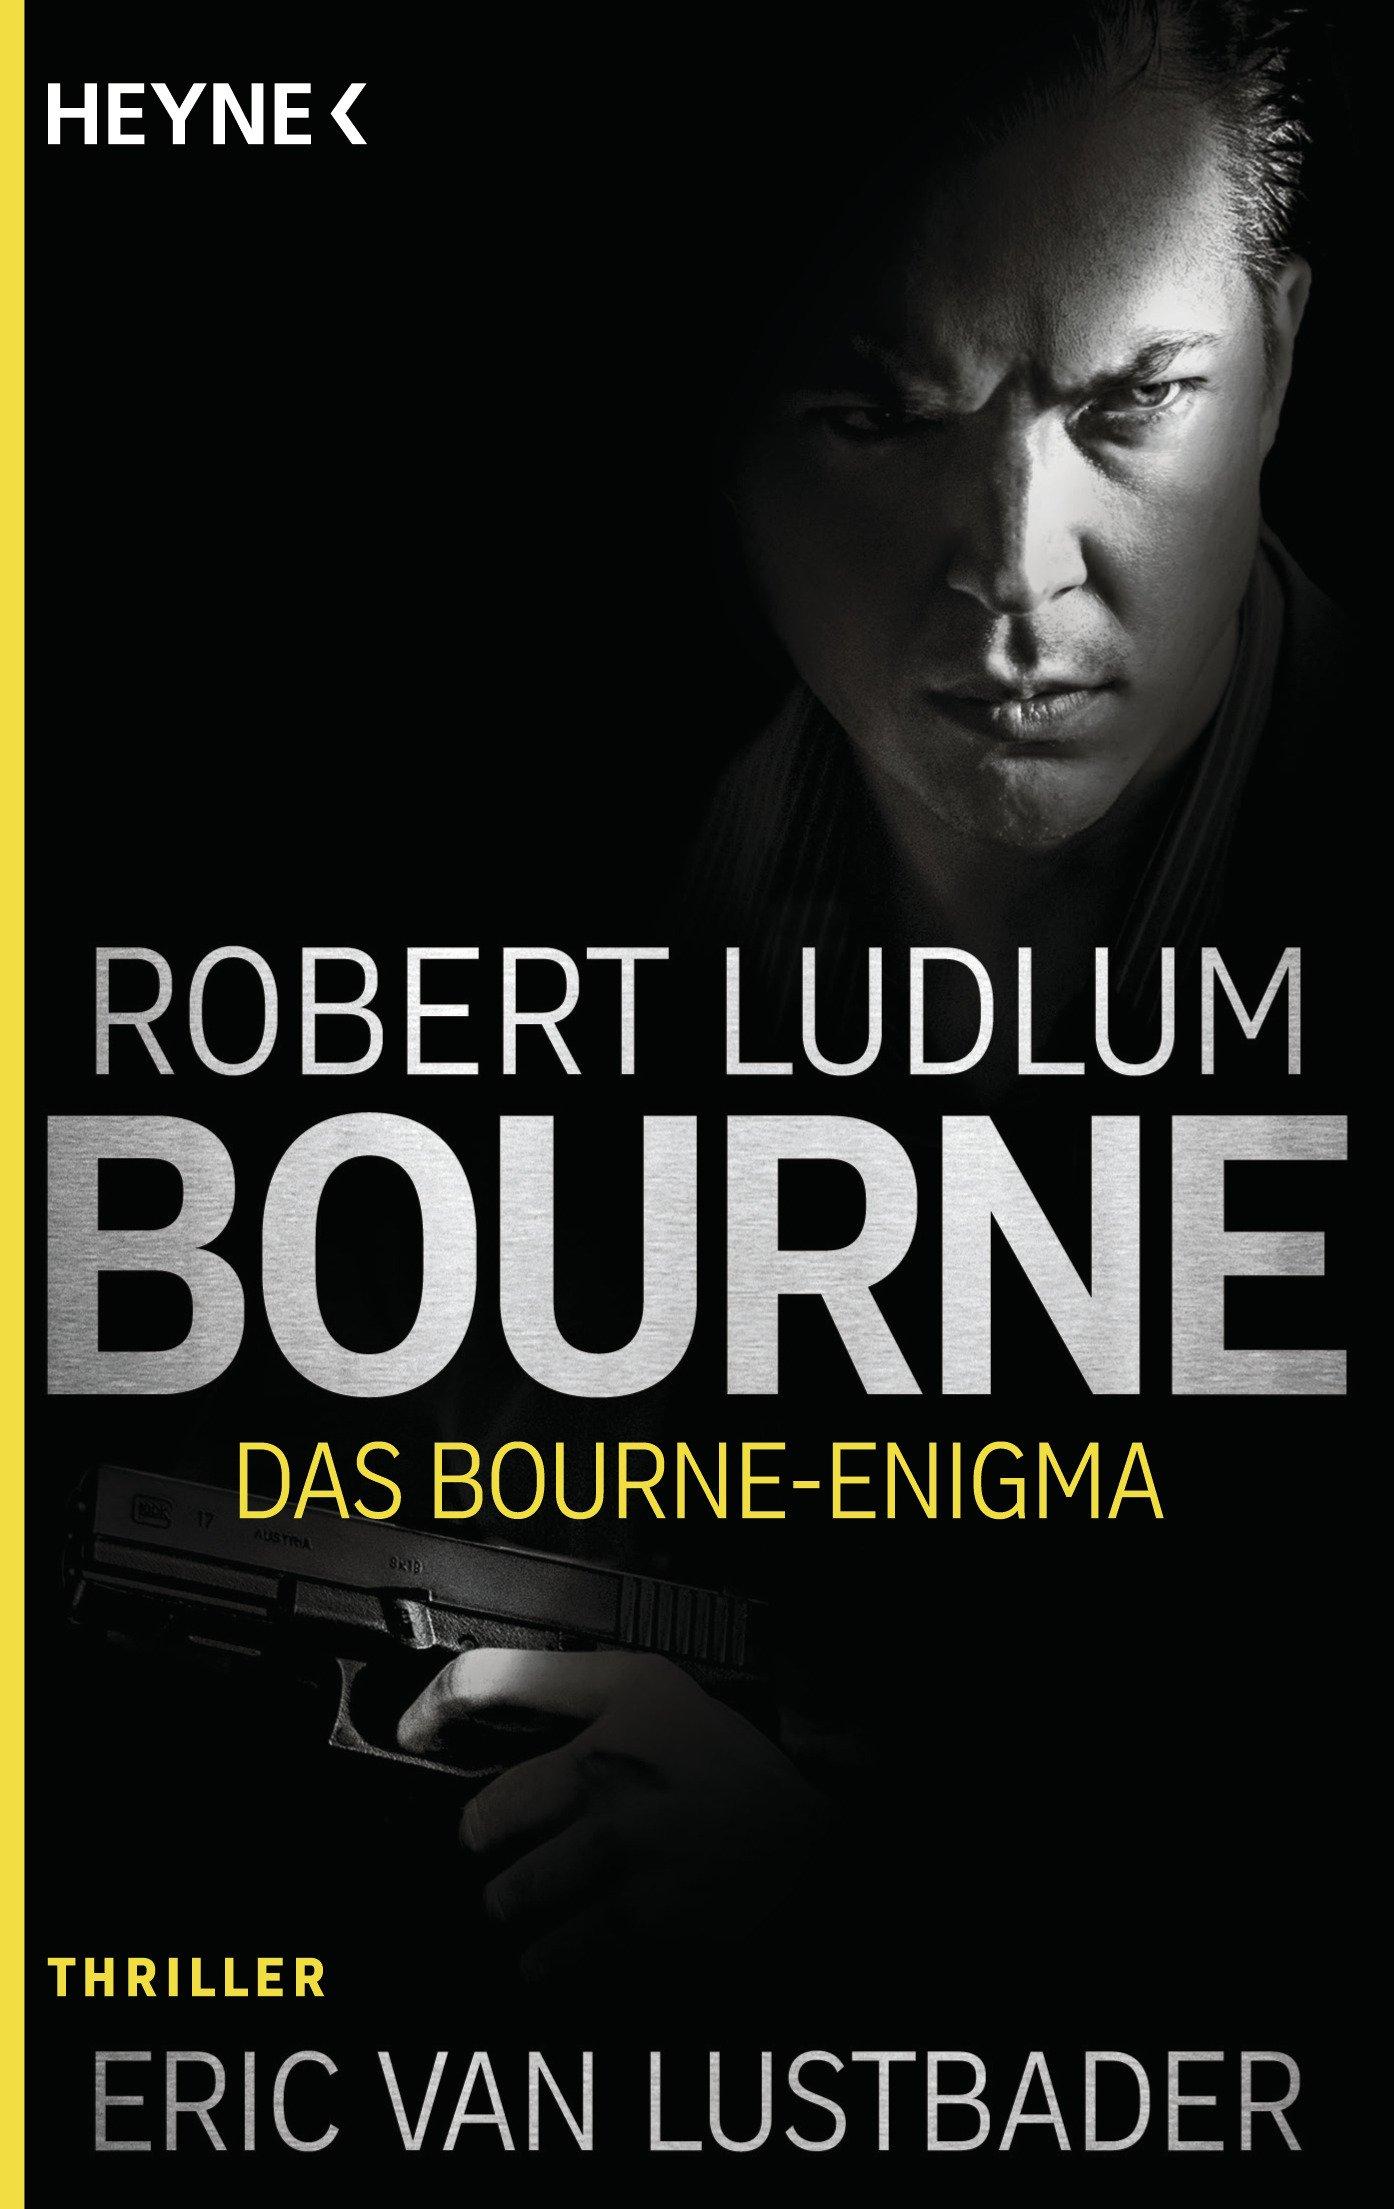 Robert Ludlum & Eric Van Lustbader - Das Bourne-Enigma (JASON BOURNE 13)